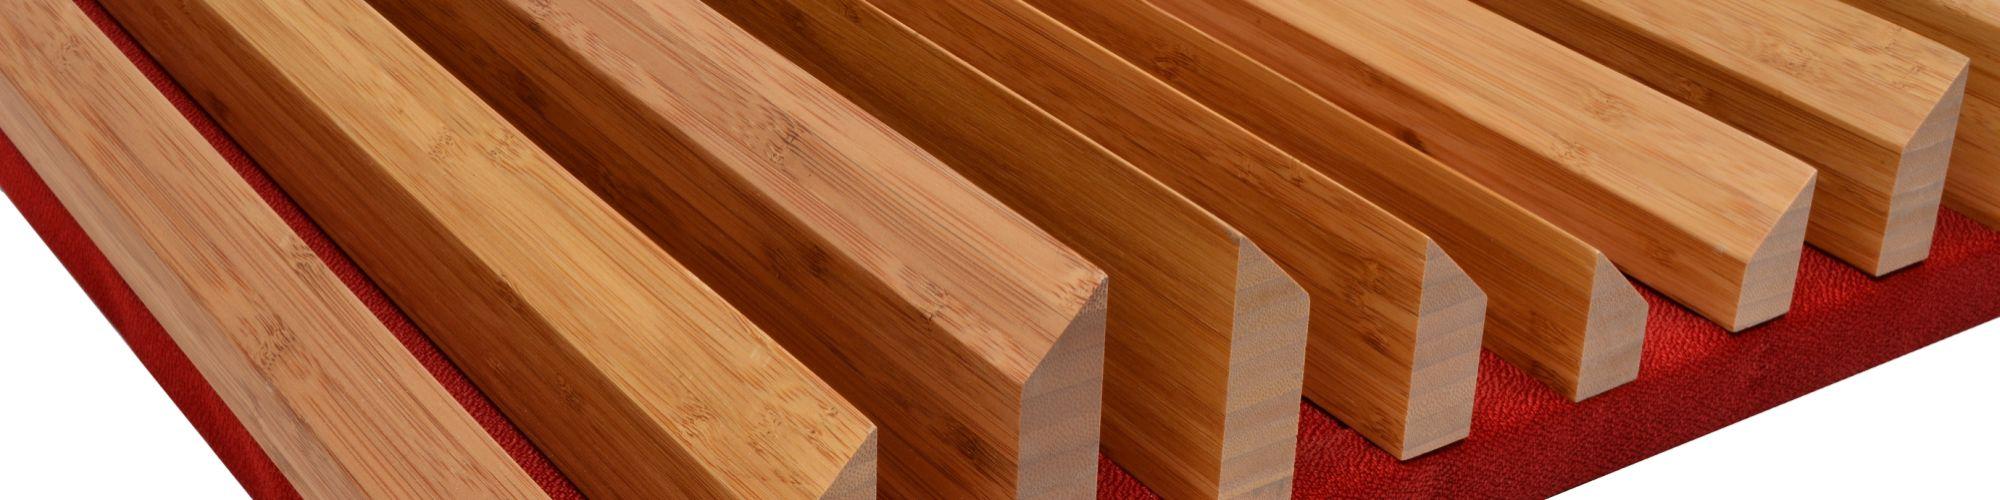 Class A Acoustic Alpha Panels Internal Walls Bcl Timber